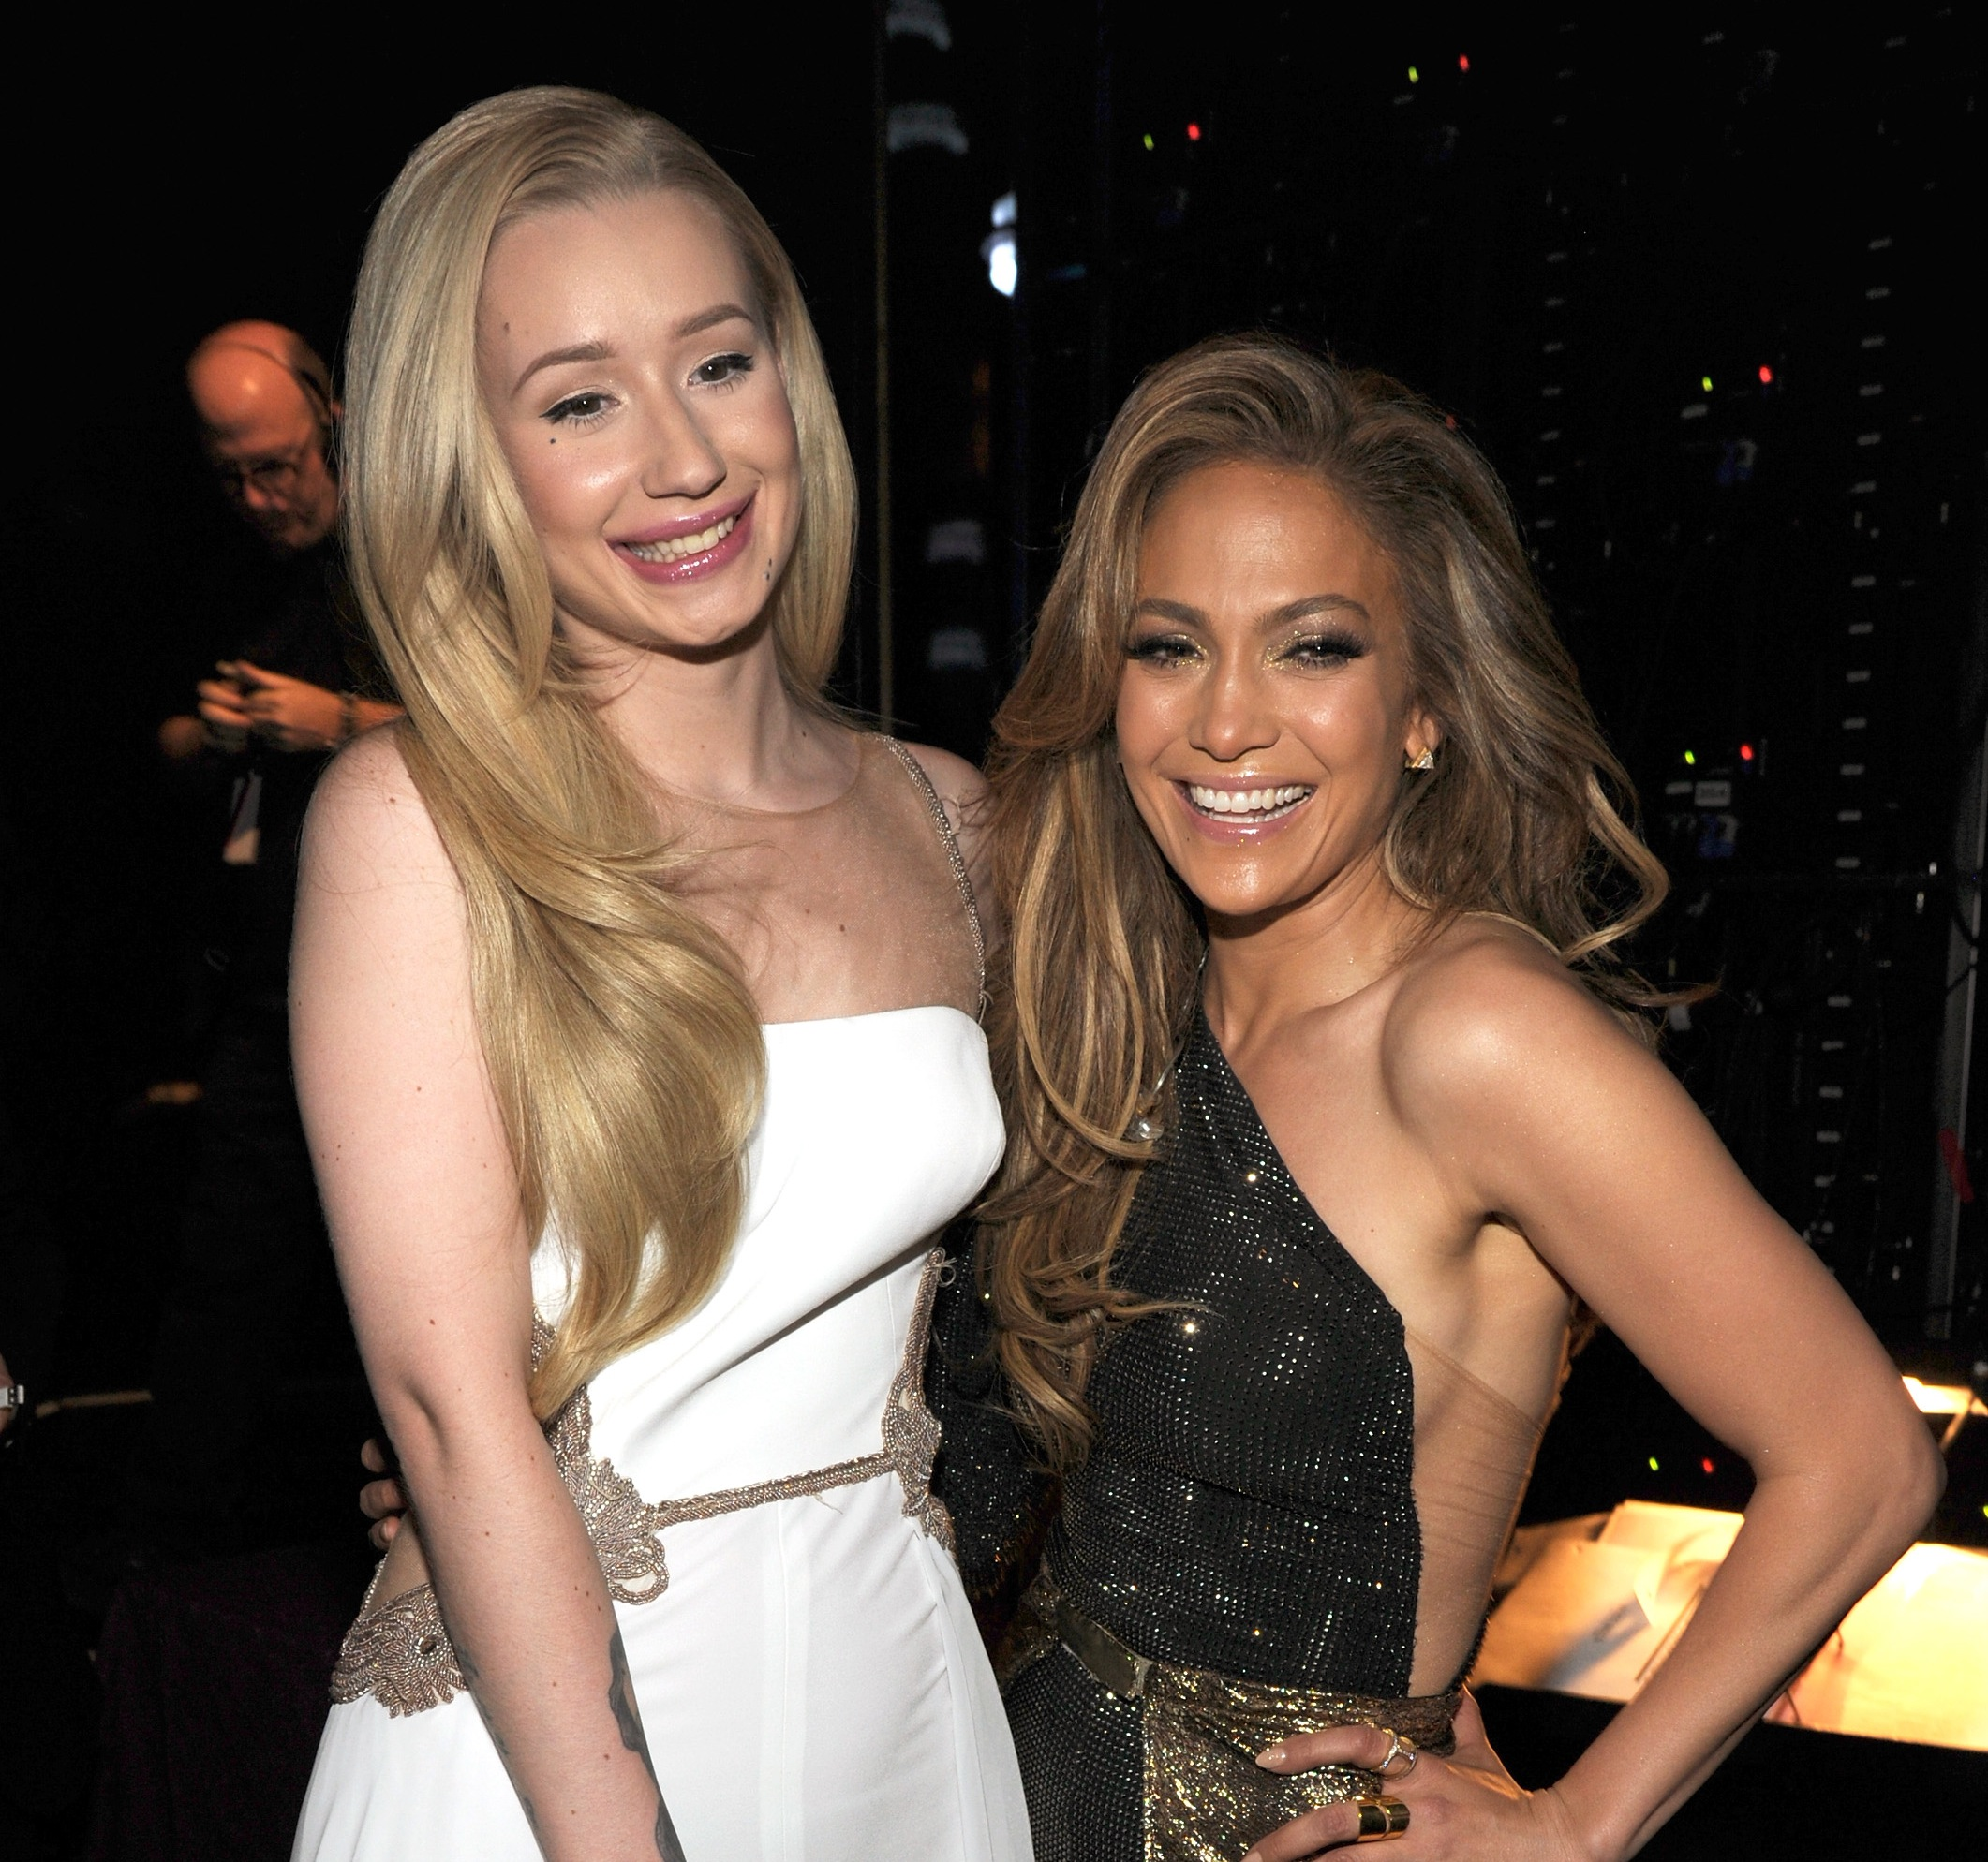 Jennifer Lopez and Iggy Azalea Team for Cheeky 'Booty' Remix